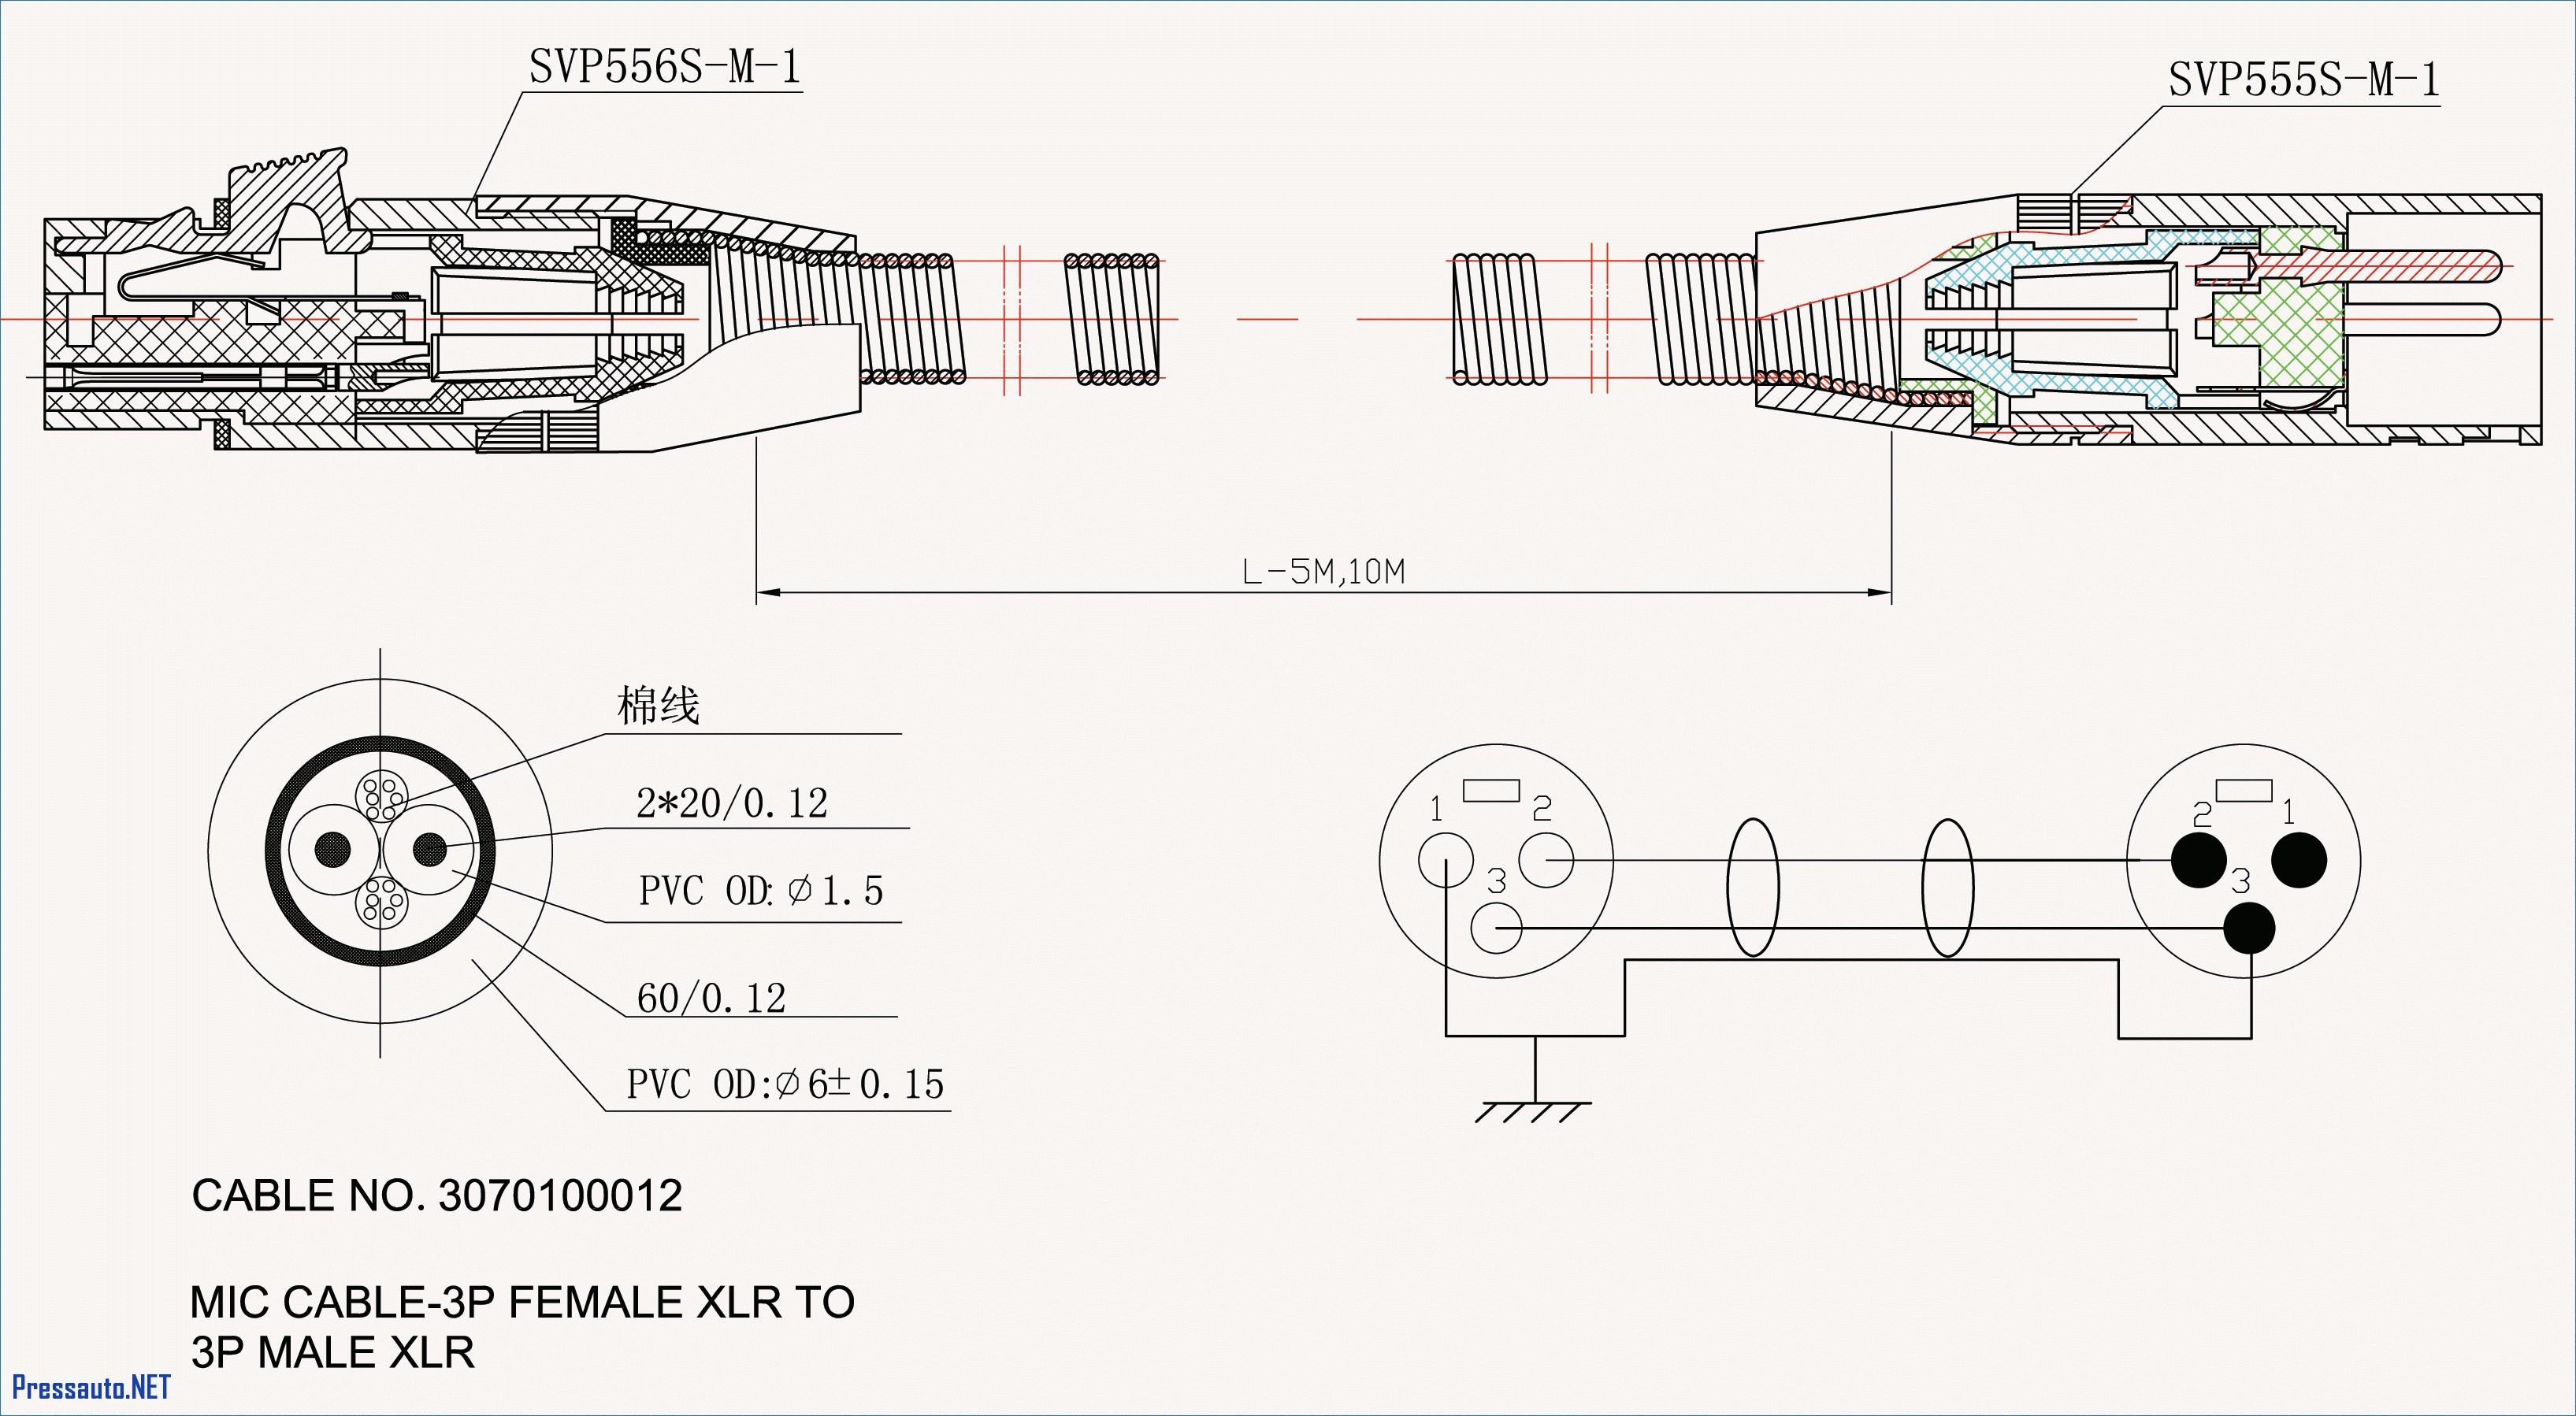 1993 Chevy S10 Wiring Diagram 1992 Dodge Caravan Wiring Diagram Experts Wiring Diagram • Of 1993 Chevy S10 Wiring Diagram